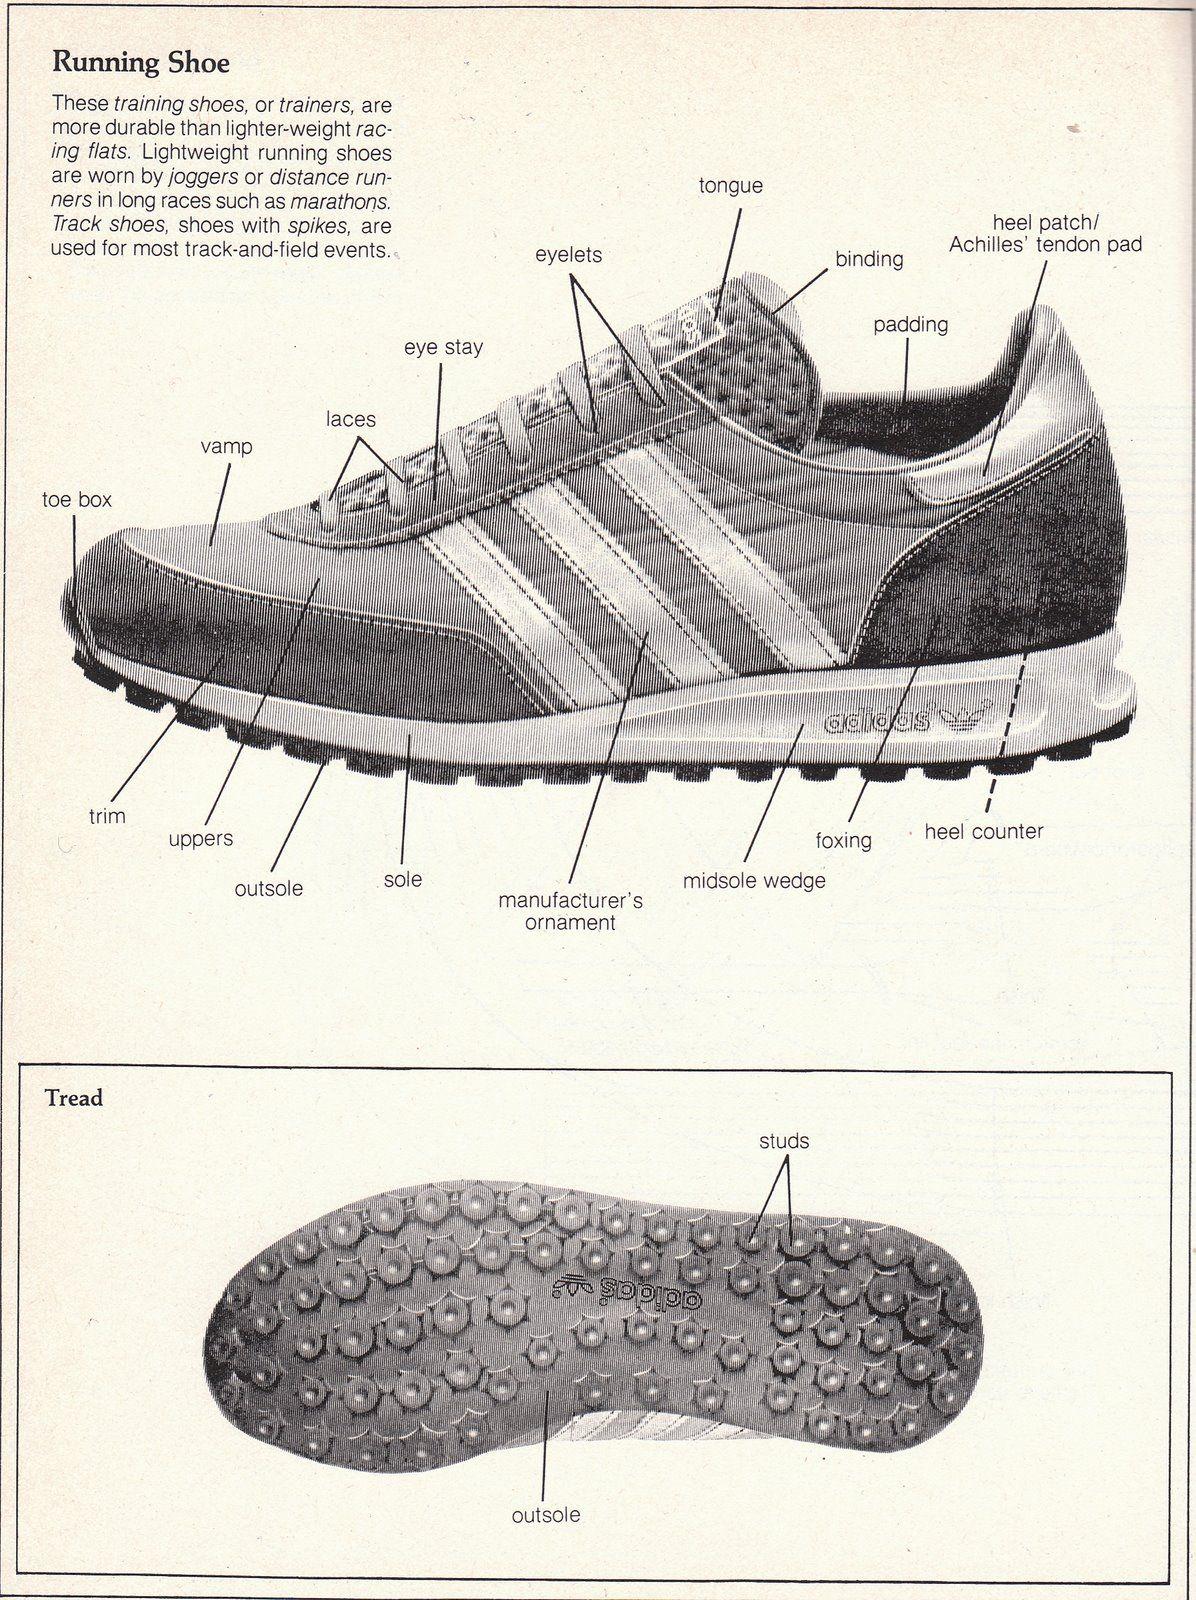 Sneakerish Sneaker Anatomy Footwear Anatomy Pinterest